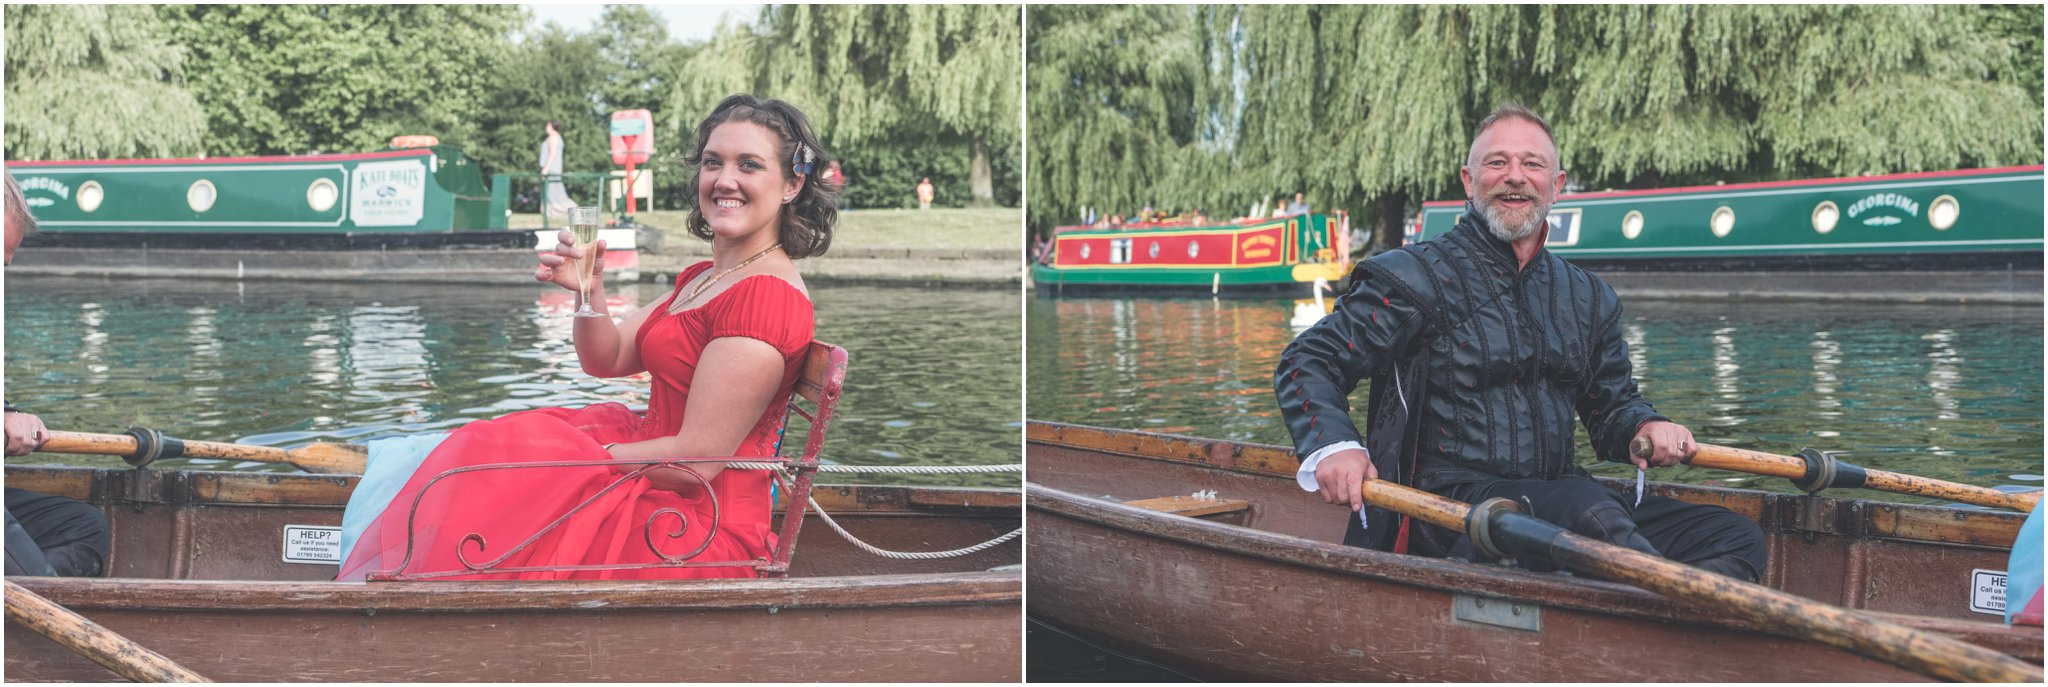 Stratford-Upon-Avon-Wedding - Robin Ball Photography-129.jpg